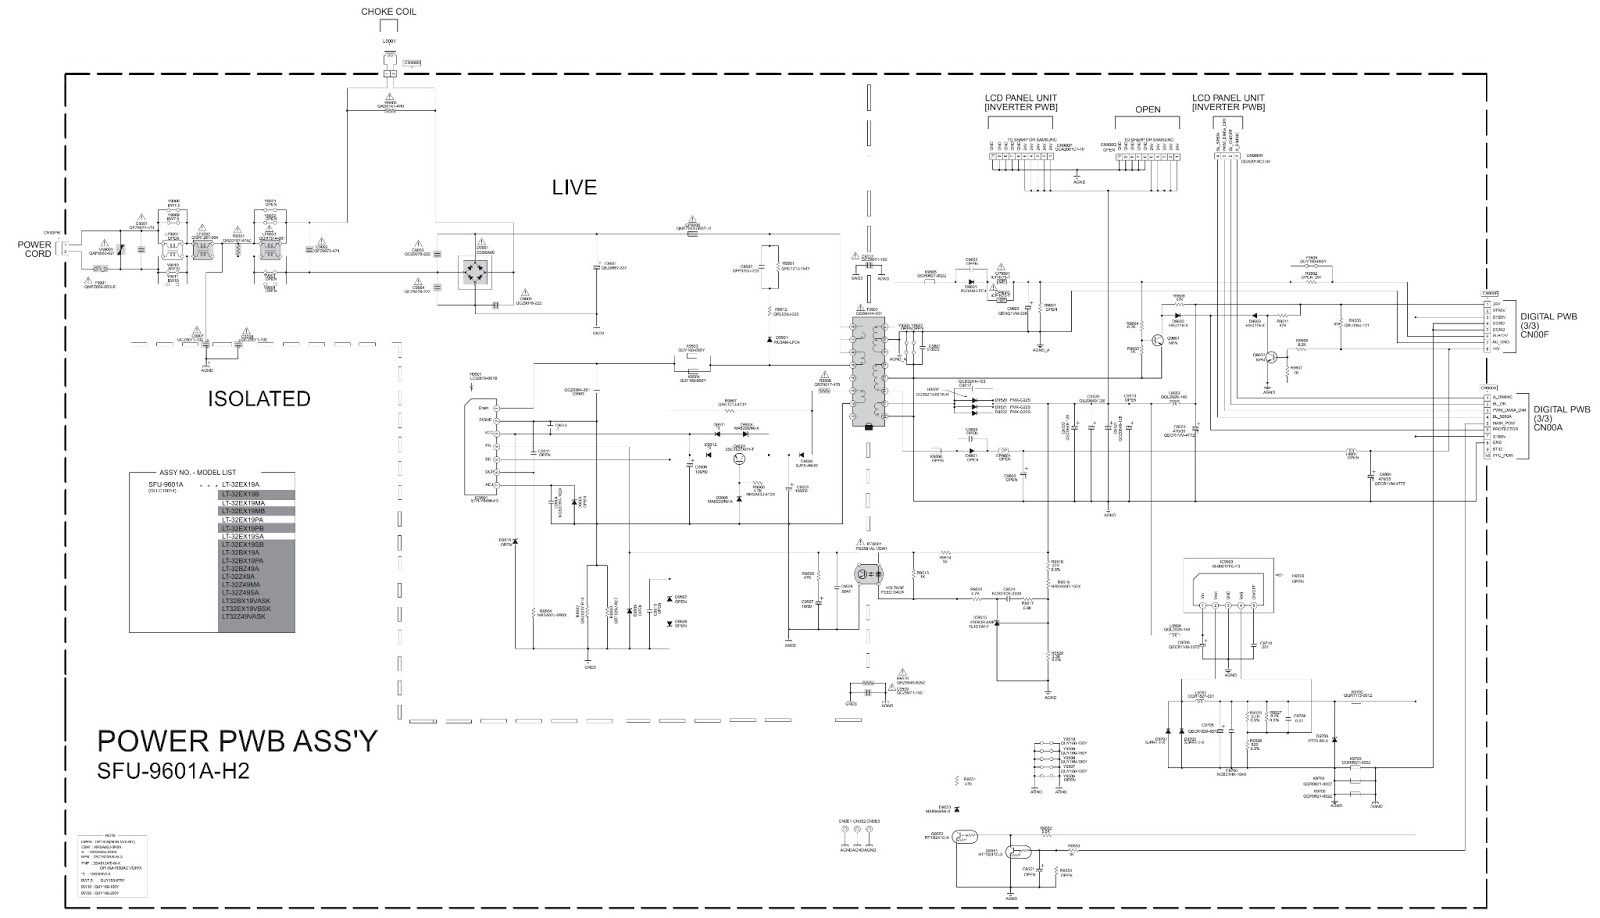 medium resolution of lt 32ex29 lt 32ex19 jvc lcd tv main power supply schematic circuit diagram jvc tv